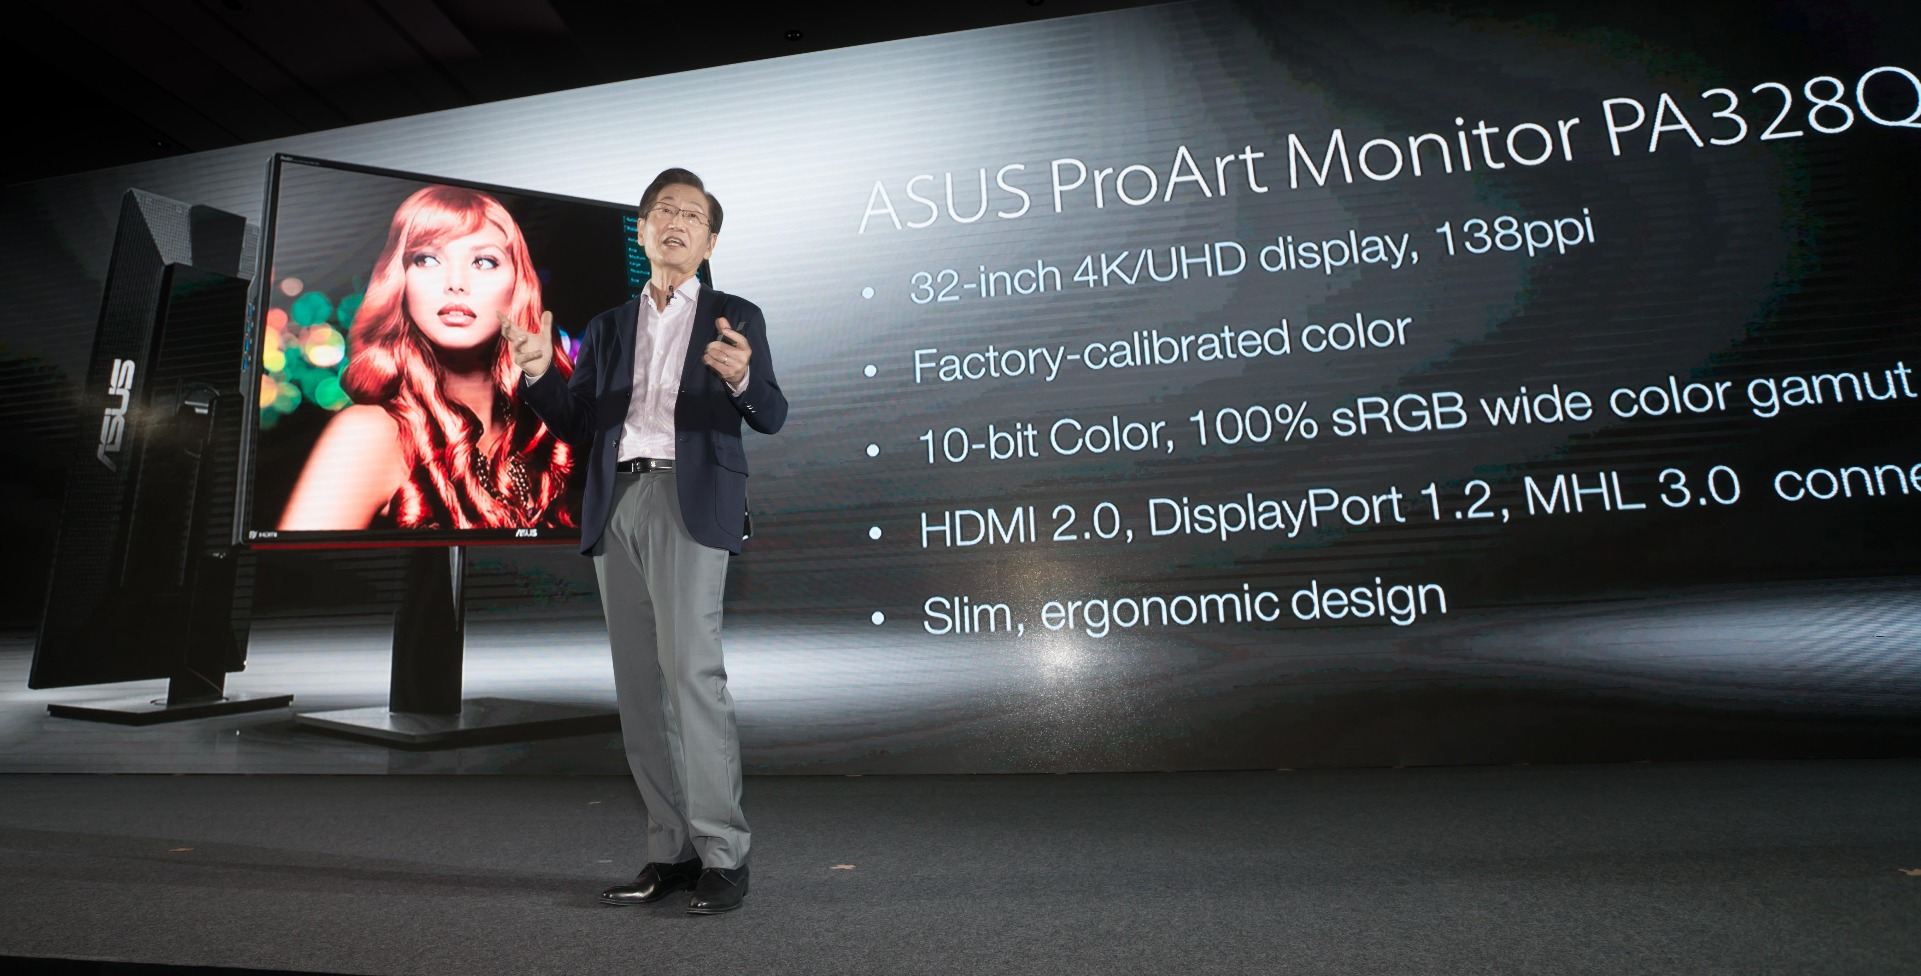 ASUS ProArt monitor